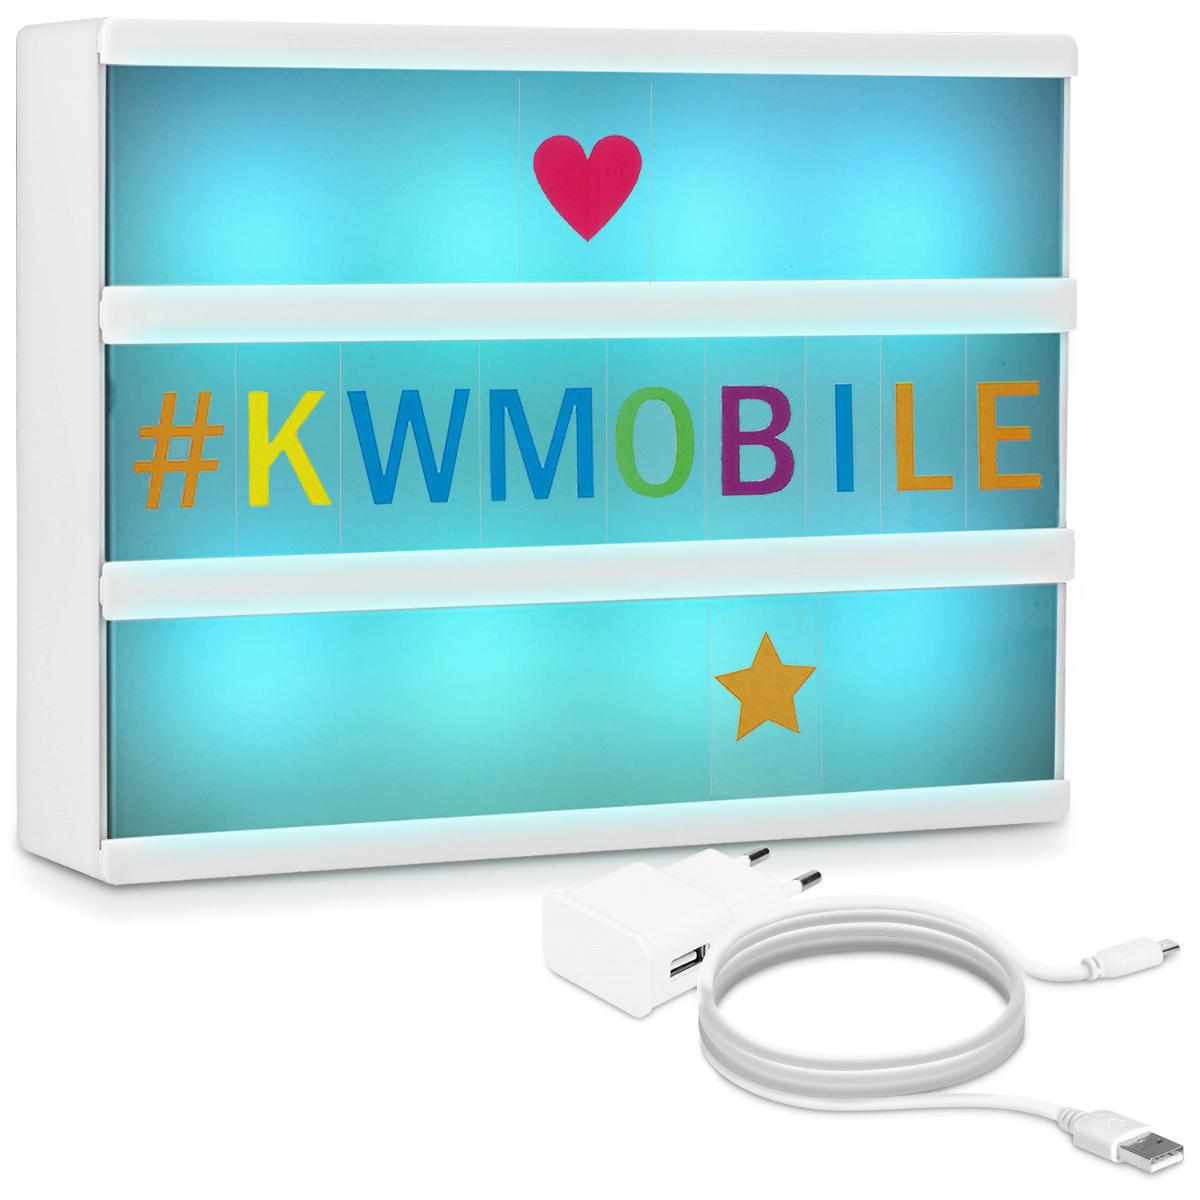 KW LED Color Change Lightbox A6 - 7 Xρώματα (42798)